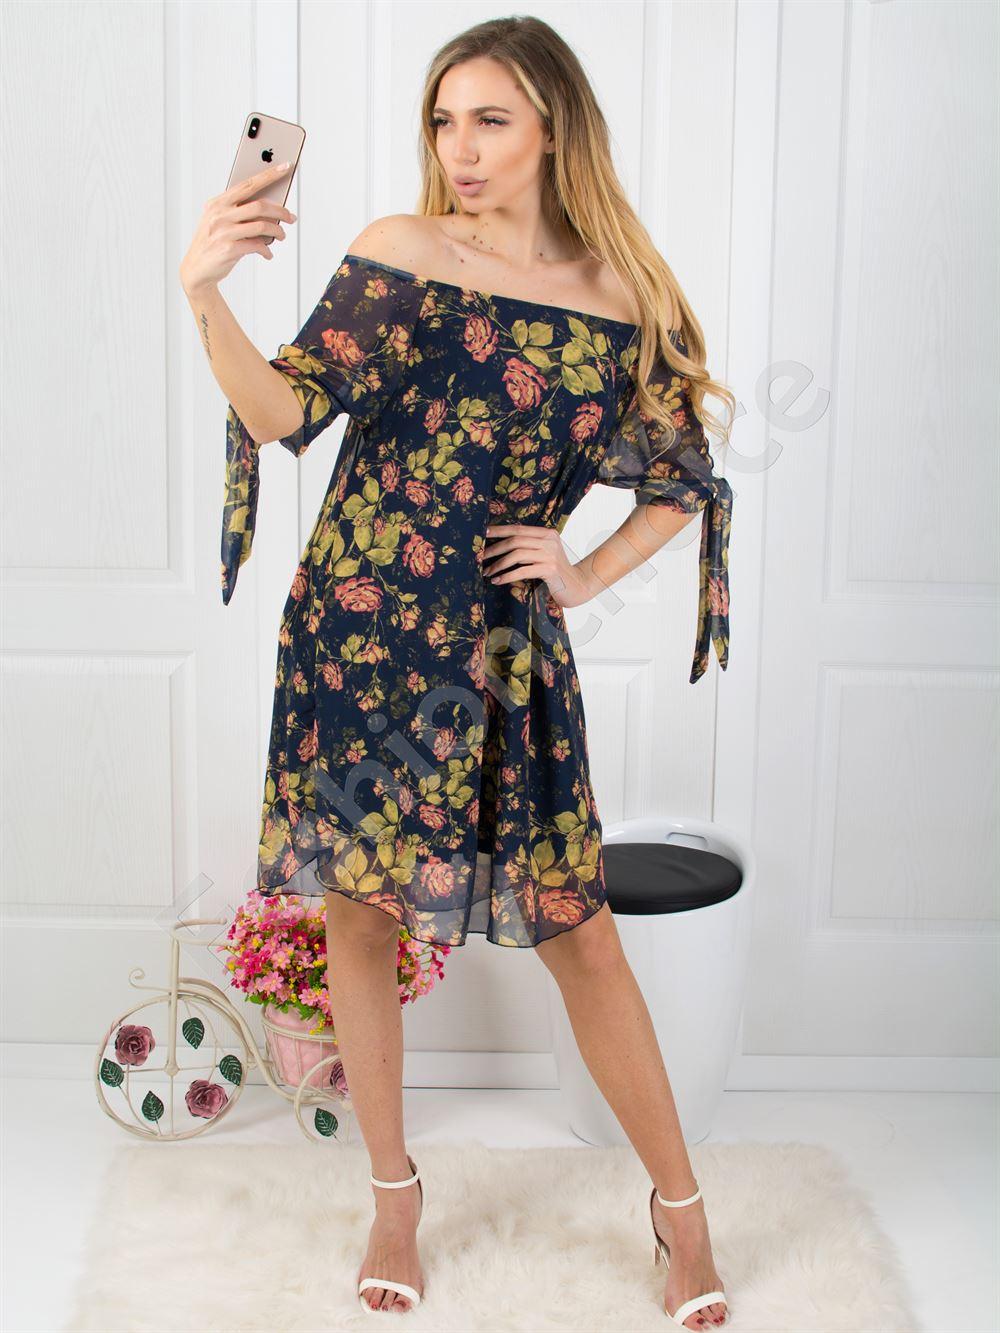 163896071b64 Φόρεμα εμπριμέ έξωμο κωδ 0587 από το fashionchoice online